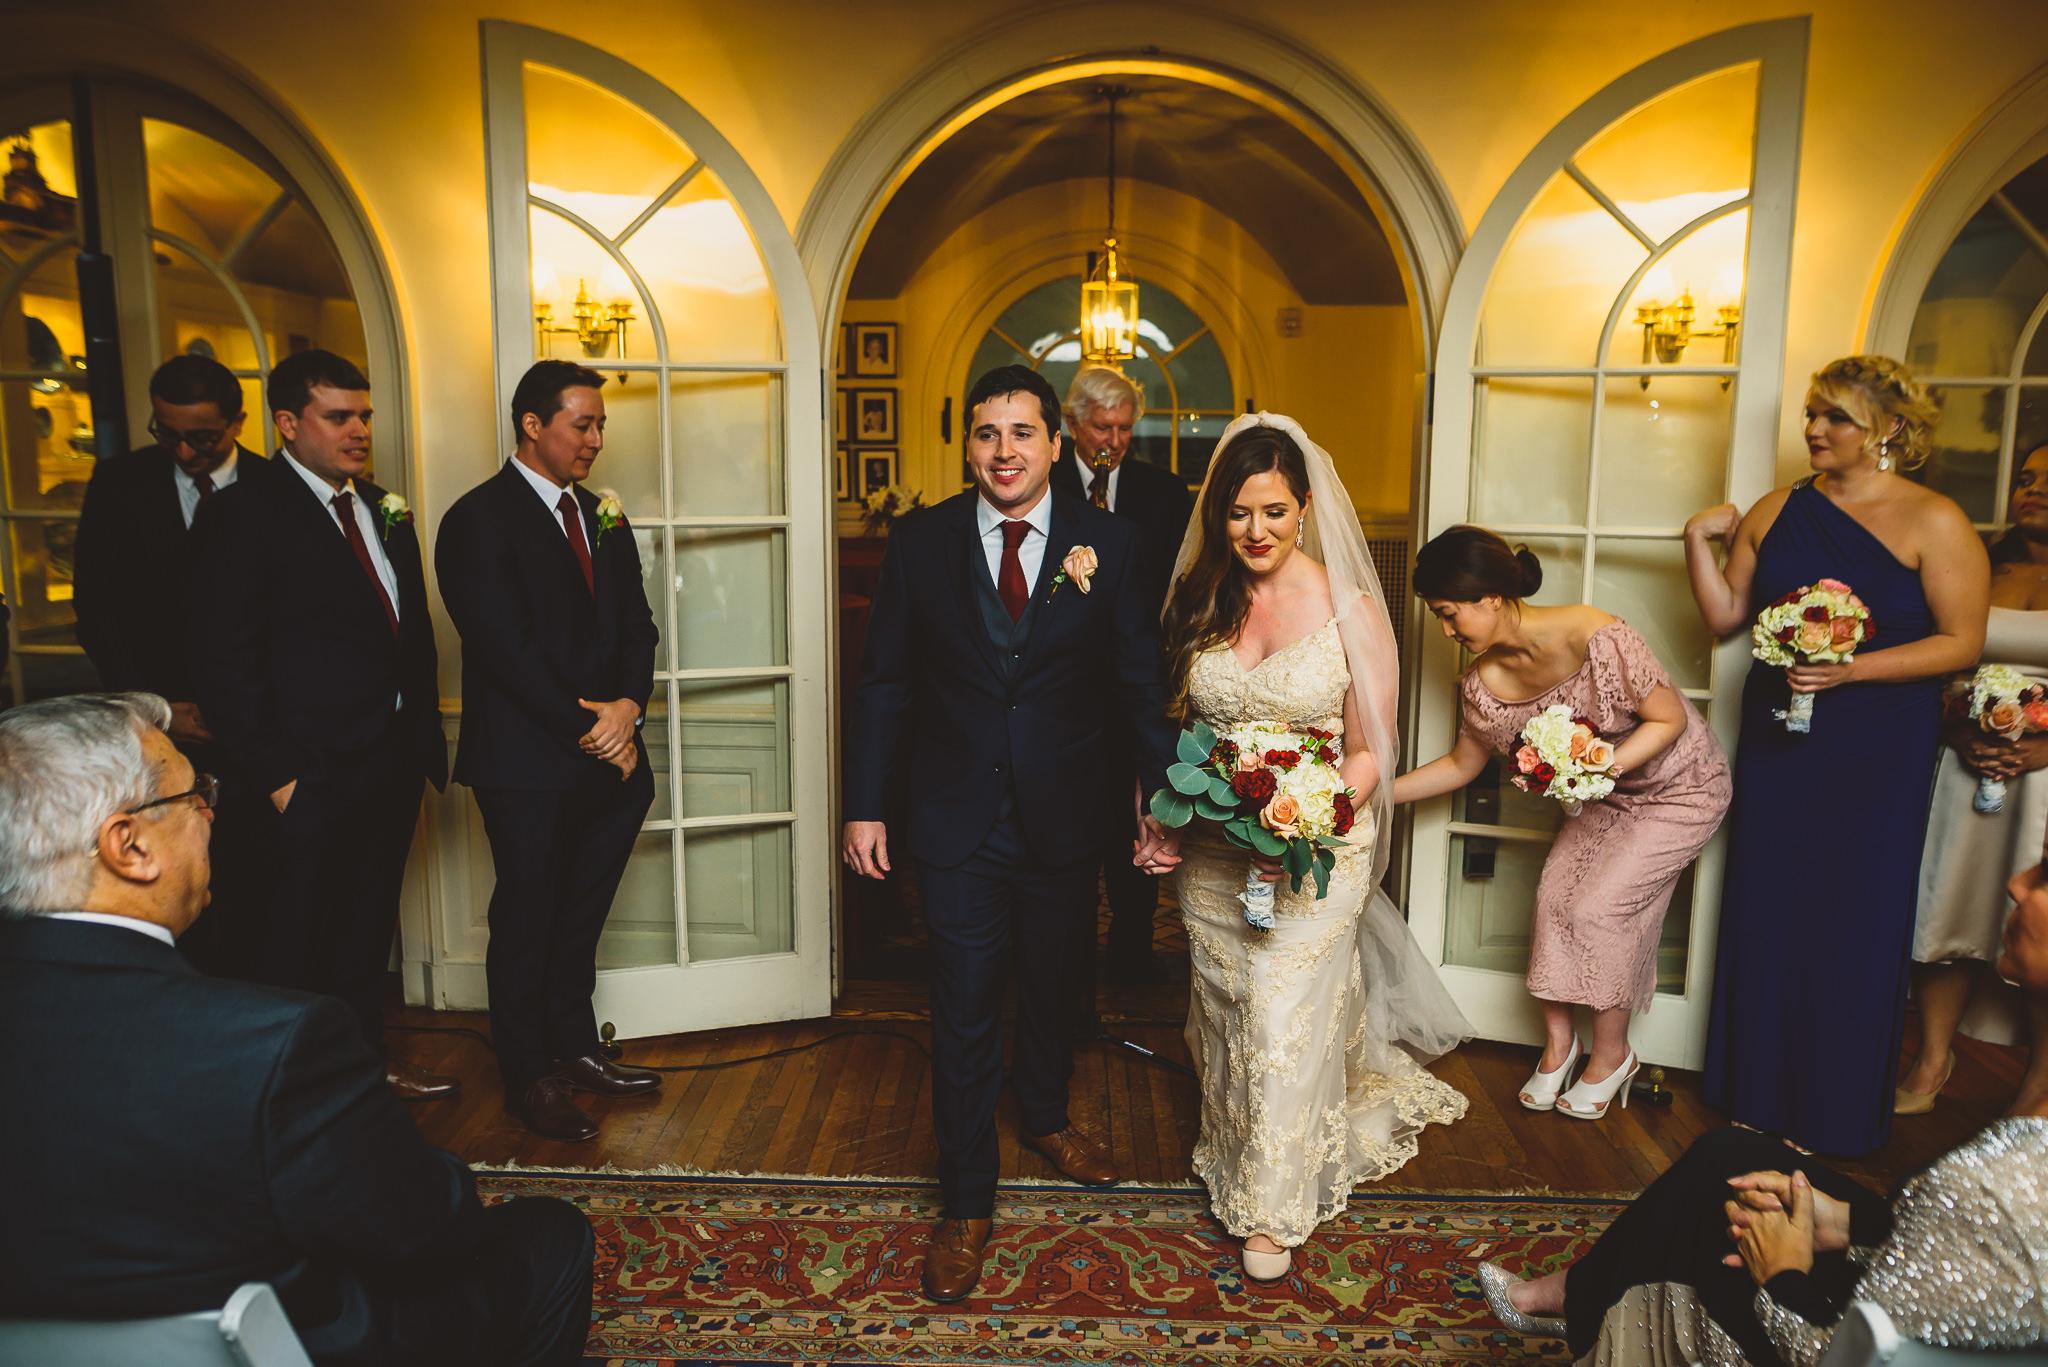 Colonial_Dames_Society_Wedding-0040.jpg